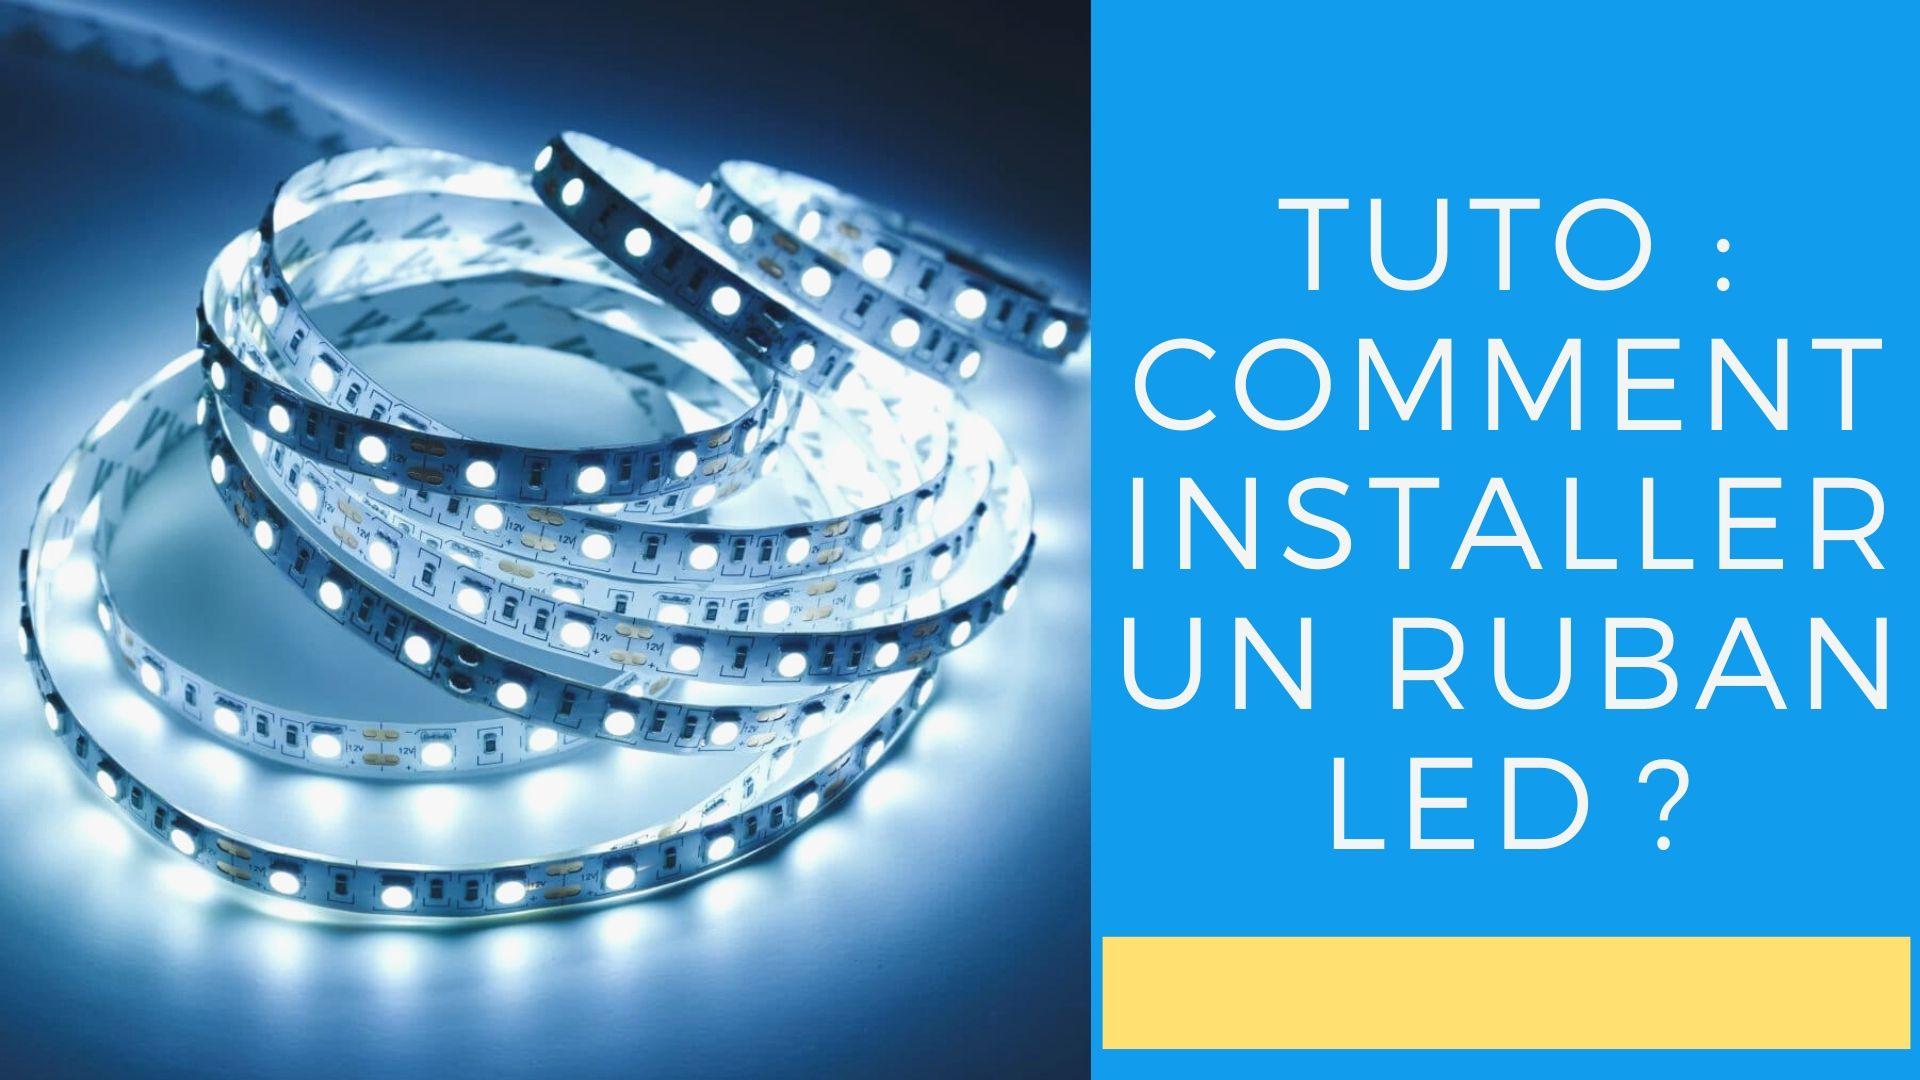 Ruban Led Pour Eclairage Principal tuto : comment installer un ruban led ?